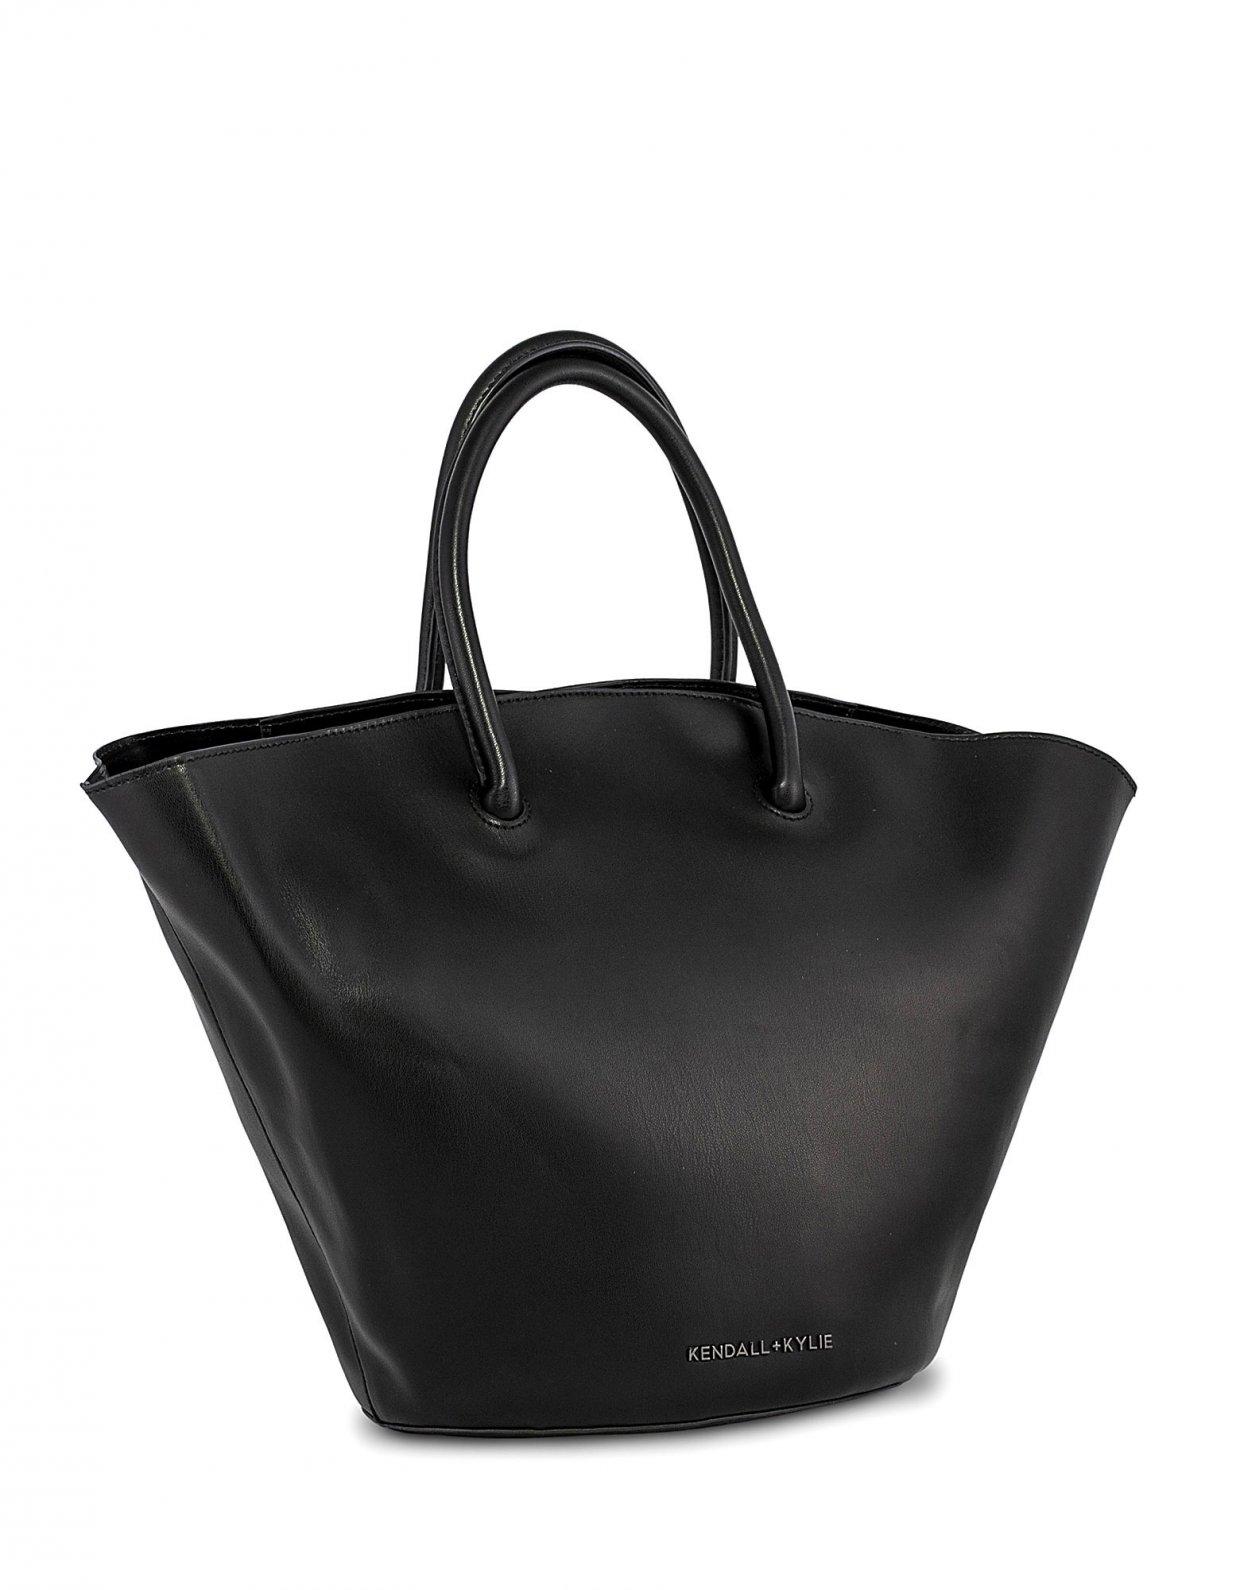 Kendall + Kylie Paradise tote bag black